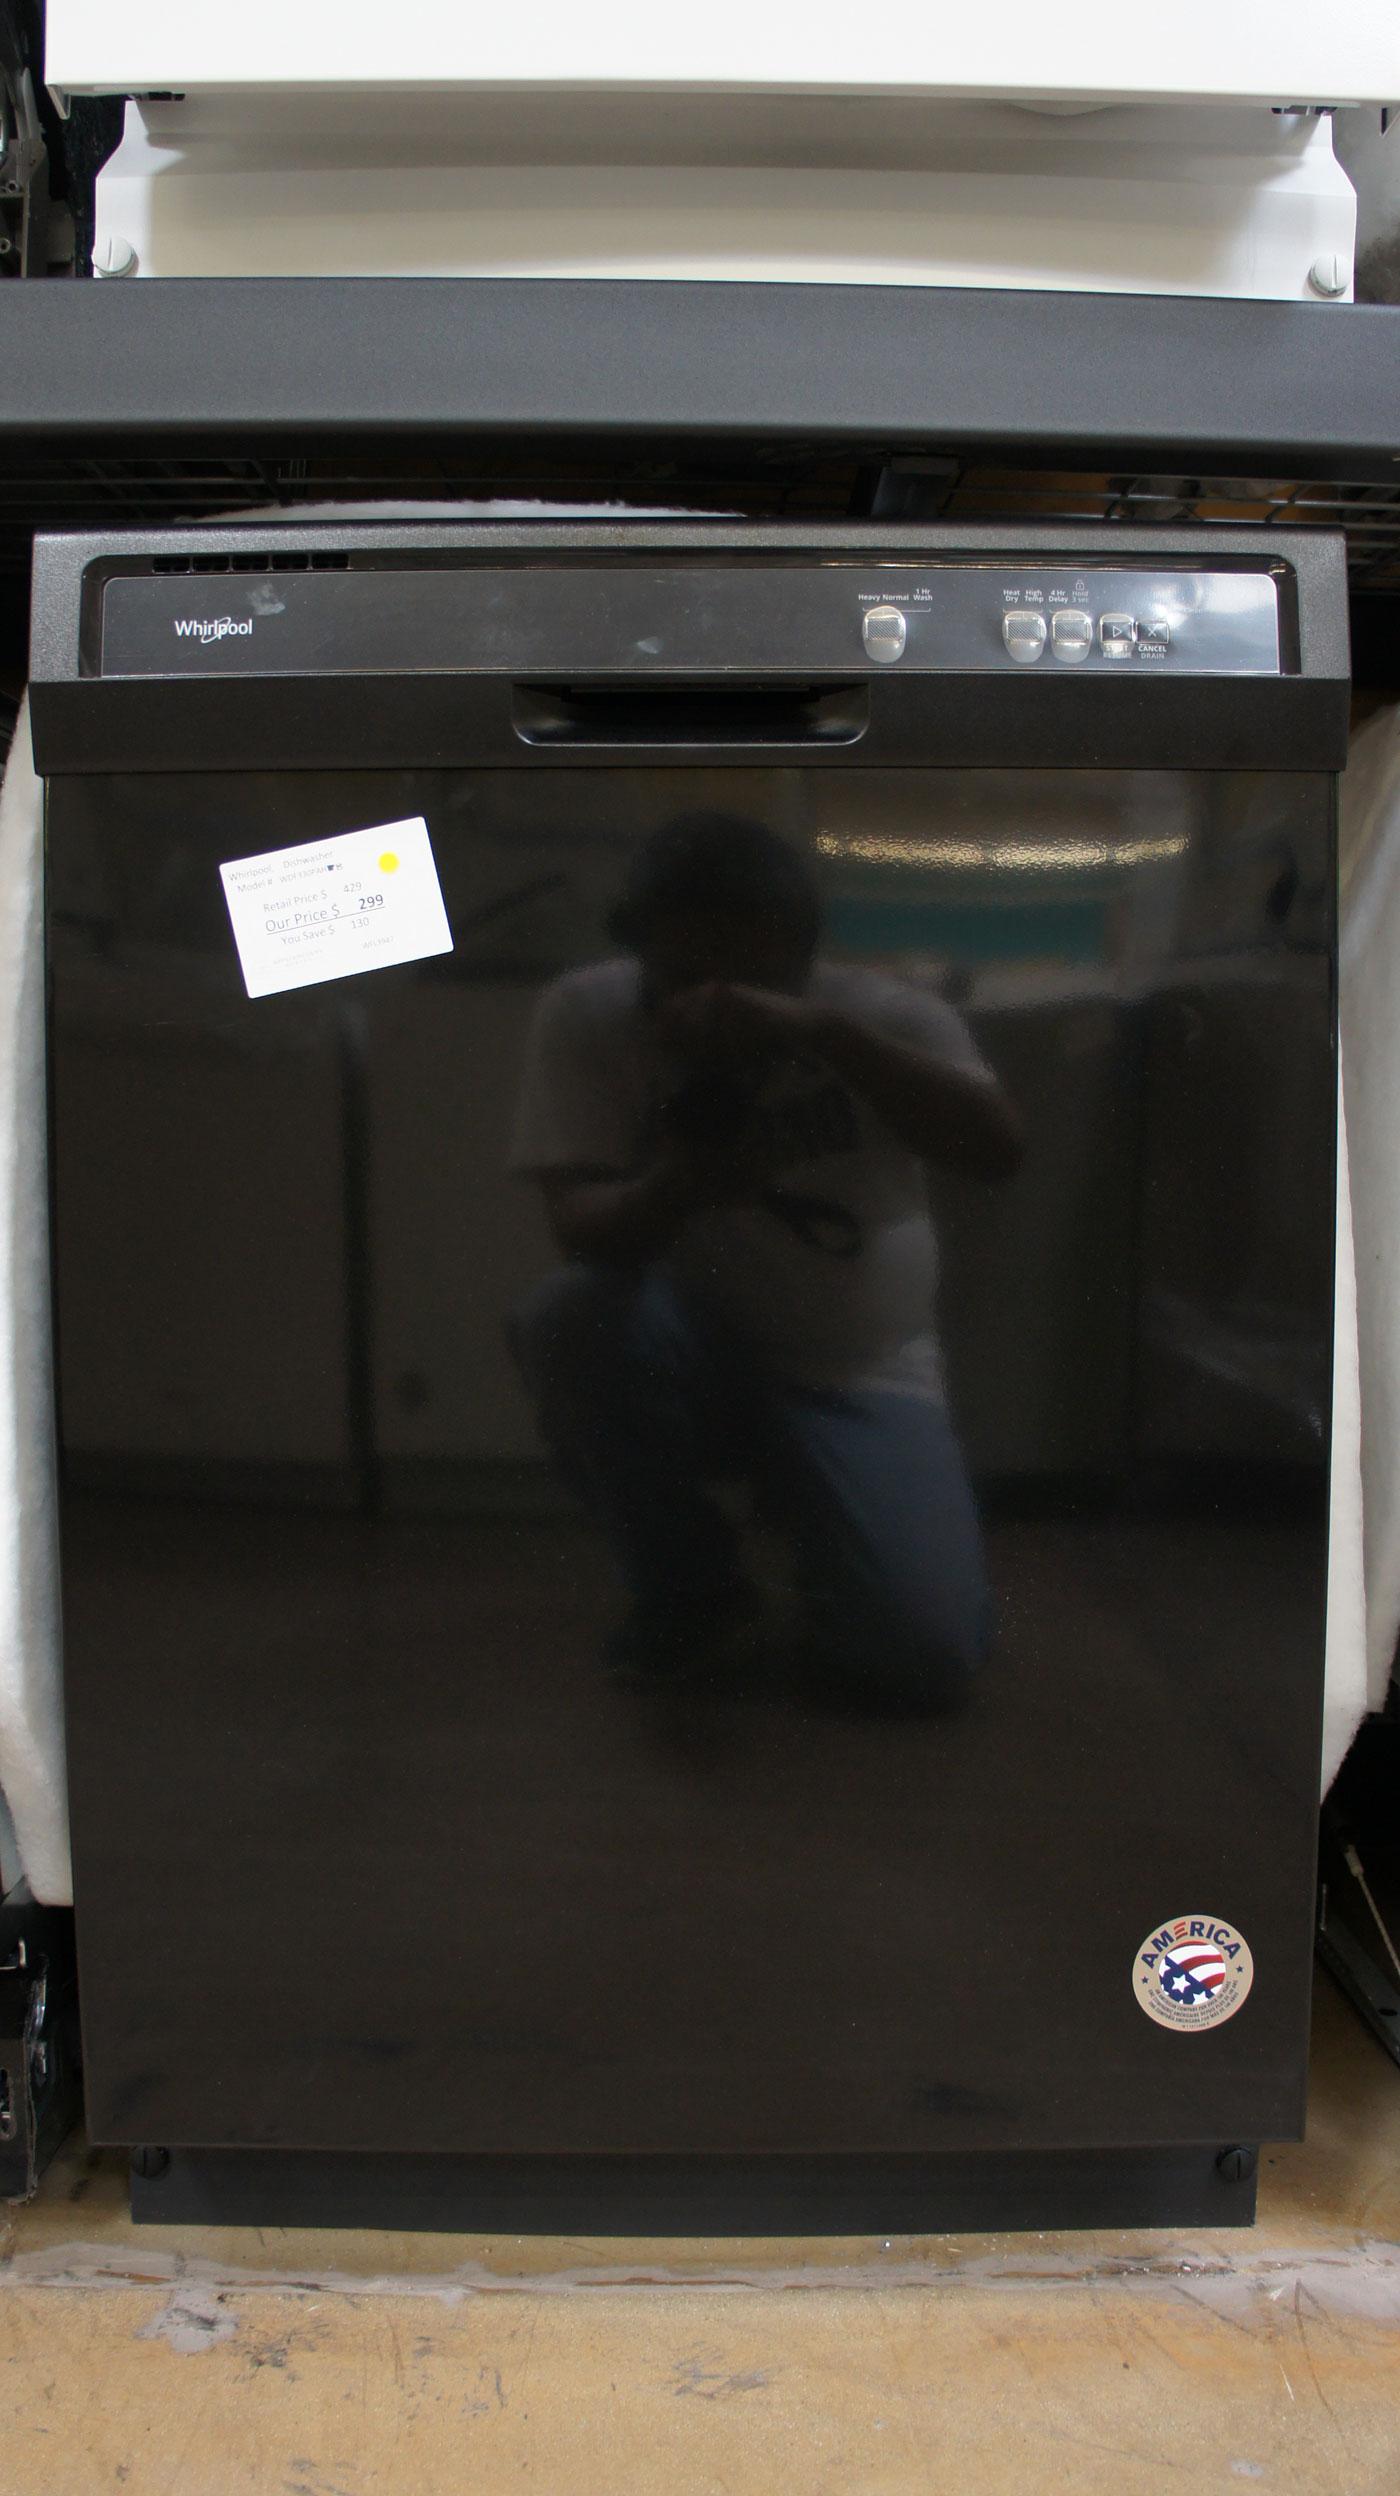 "24"" Whirlpool WDF330PAHB Dishwasher"